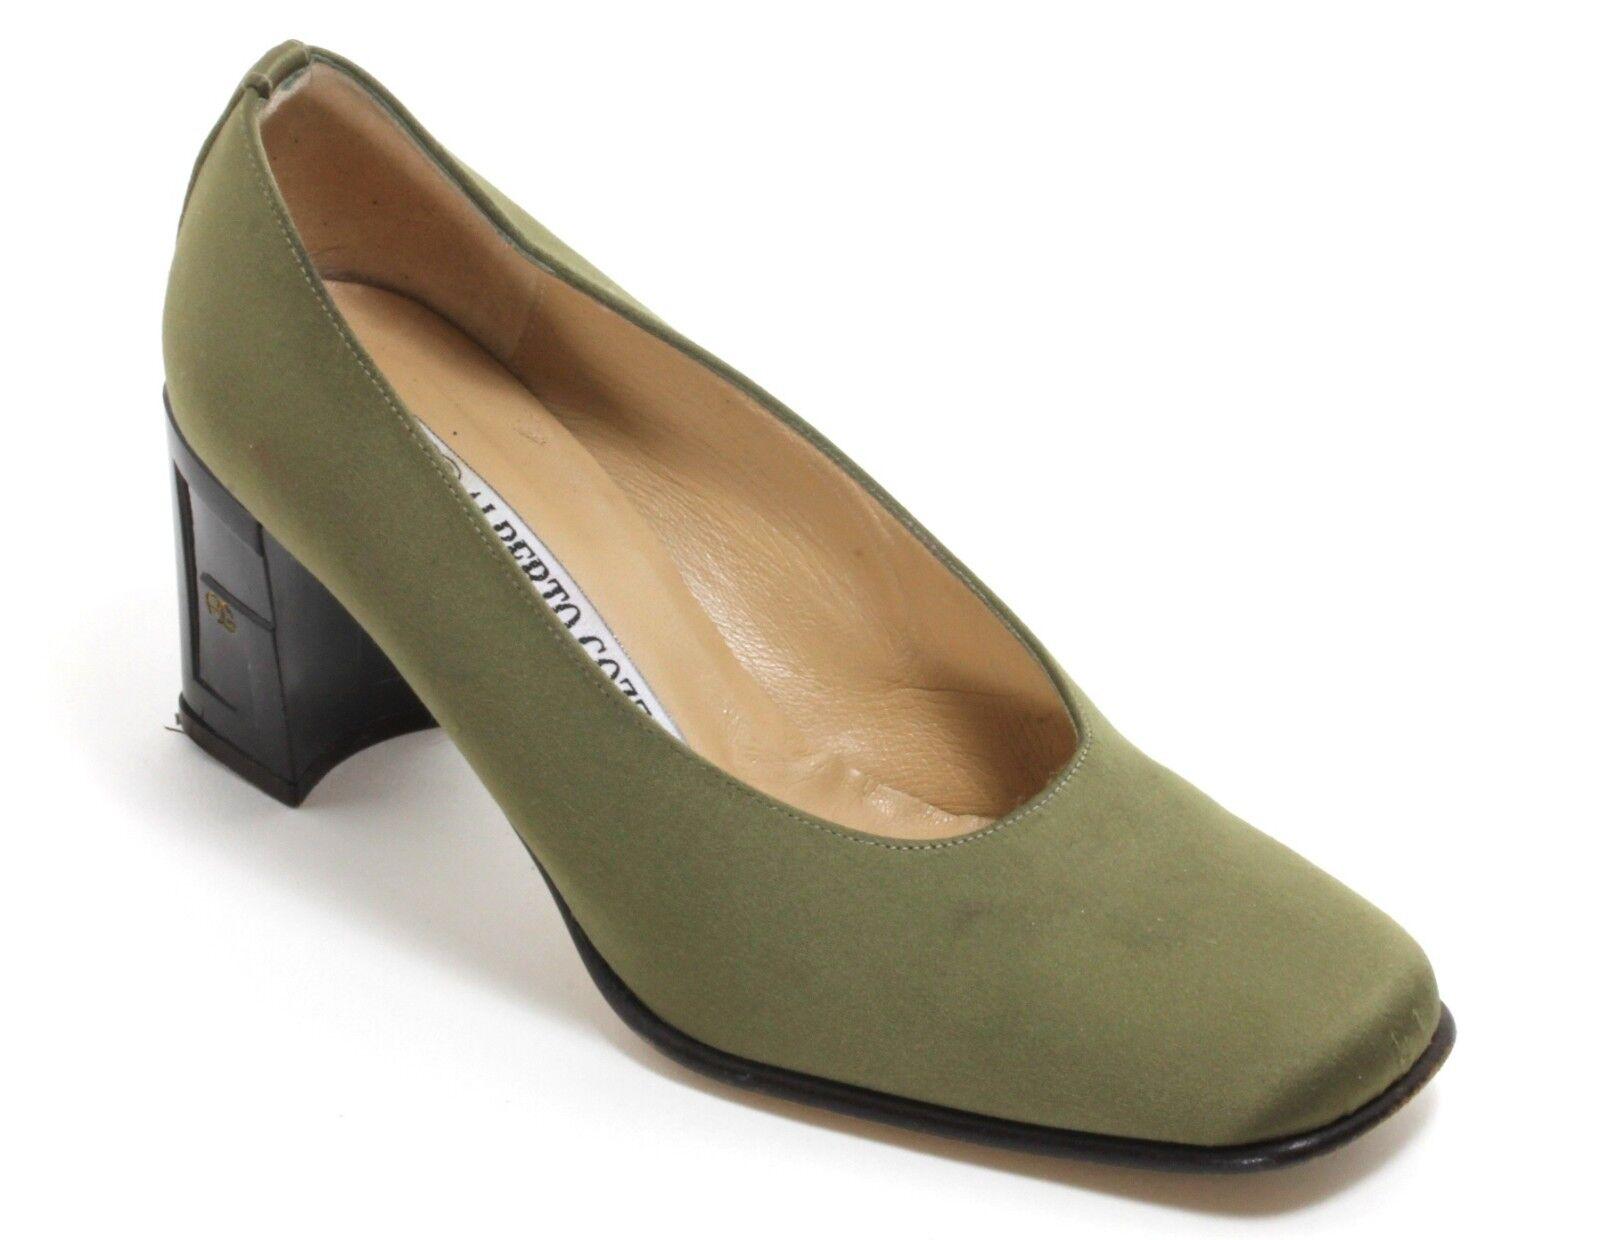 Elegant Grün Vintage Pumps Damenschuhe Leder Lack Samt Grün Elegant Alberto Gozzi 35,5 3ec12d